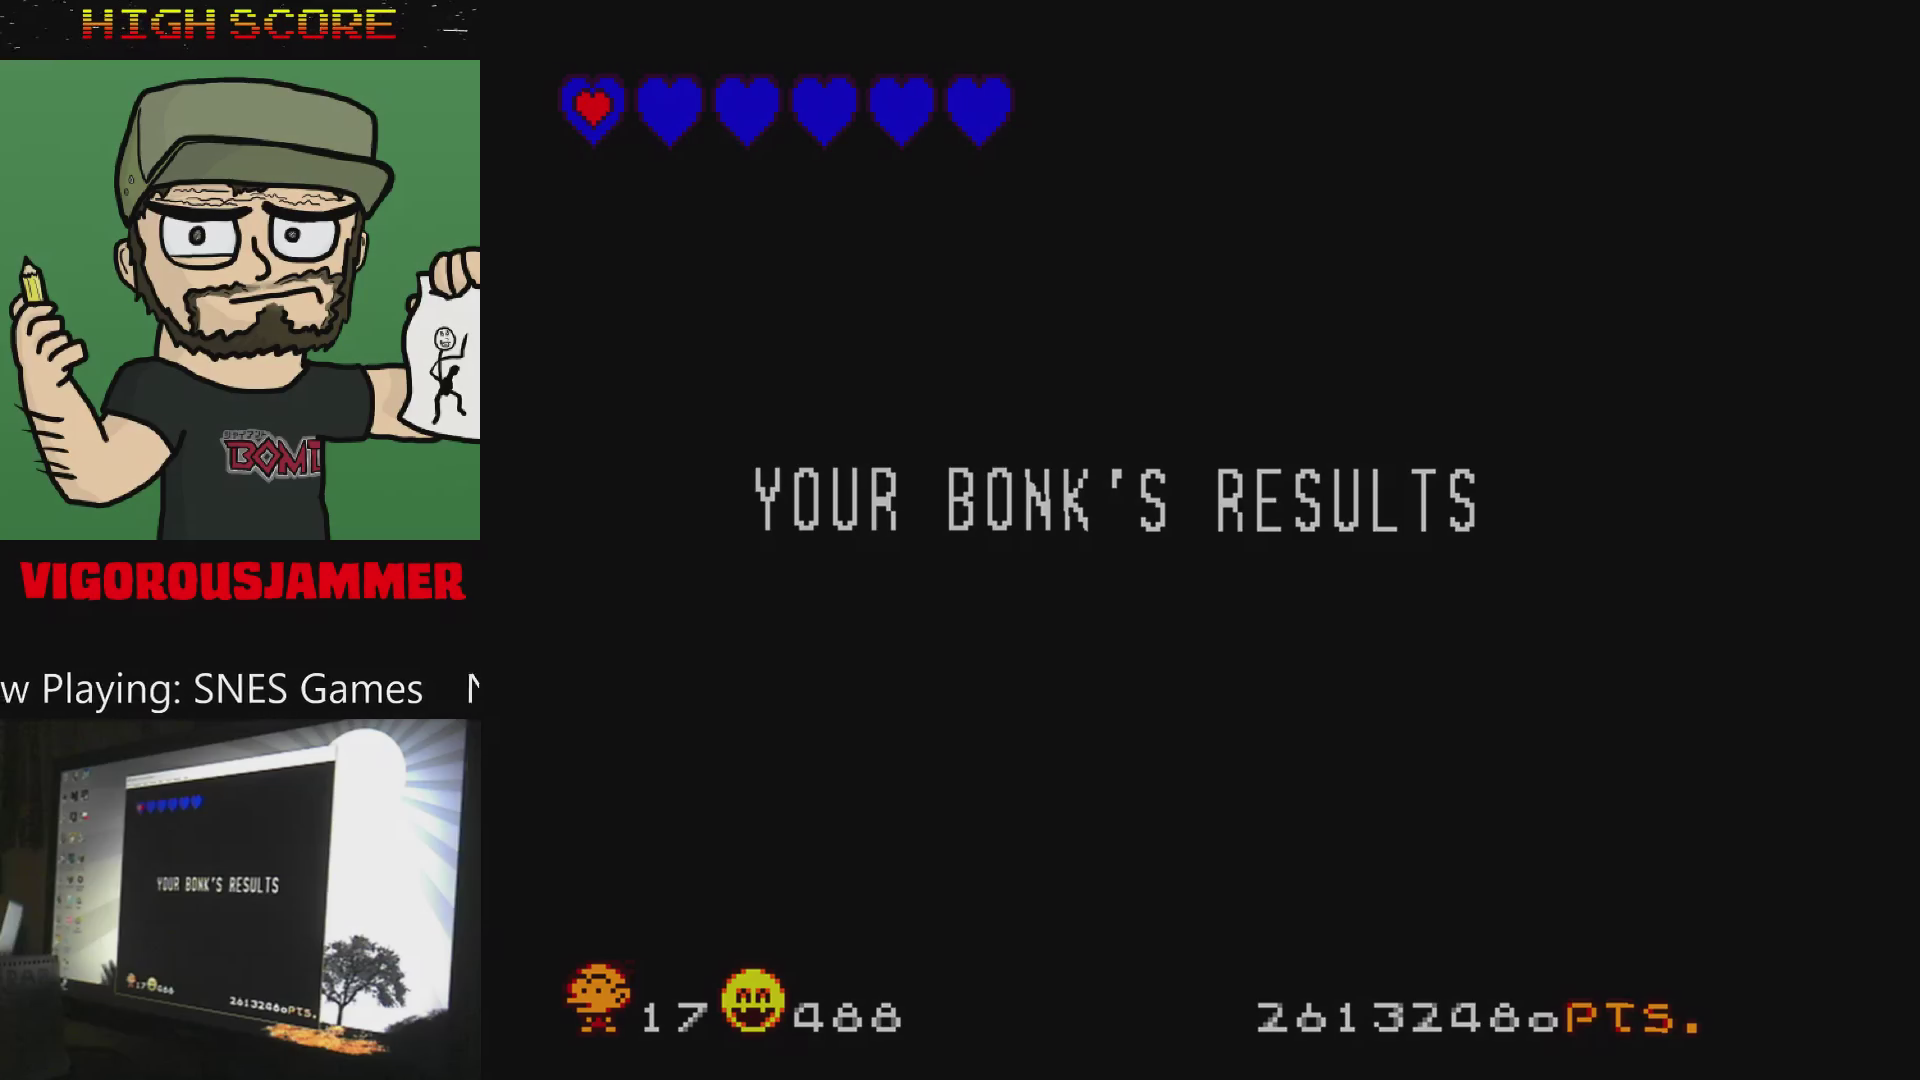 Super Bonk / Super B.C. Kid / Chou Genjin 26,132,480 points